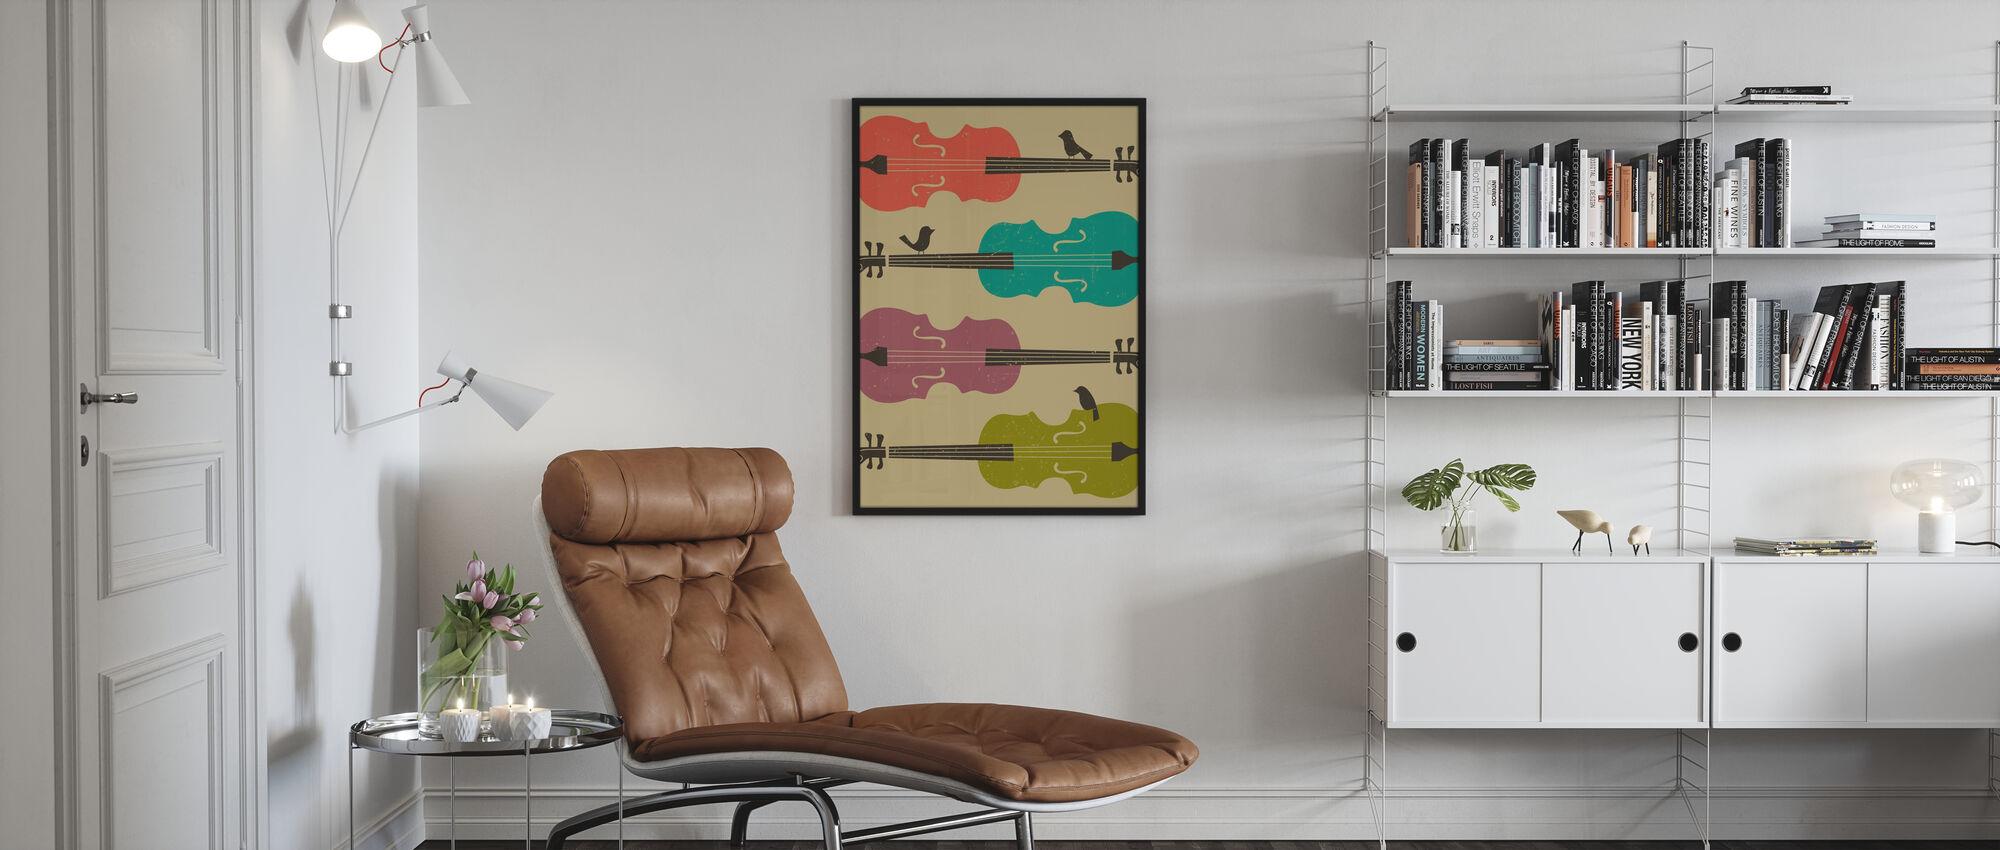 Birds on a Cello String - Framed print - Living Room